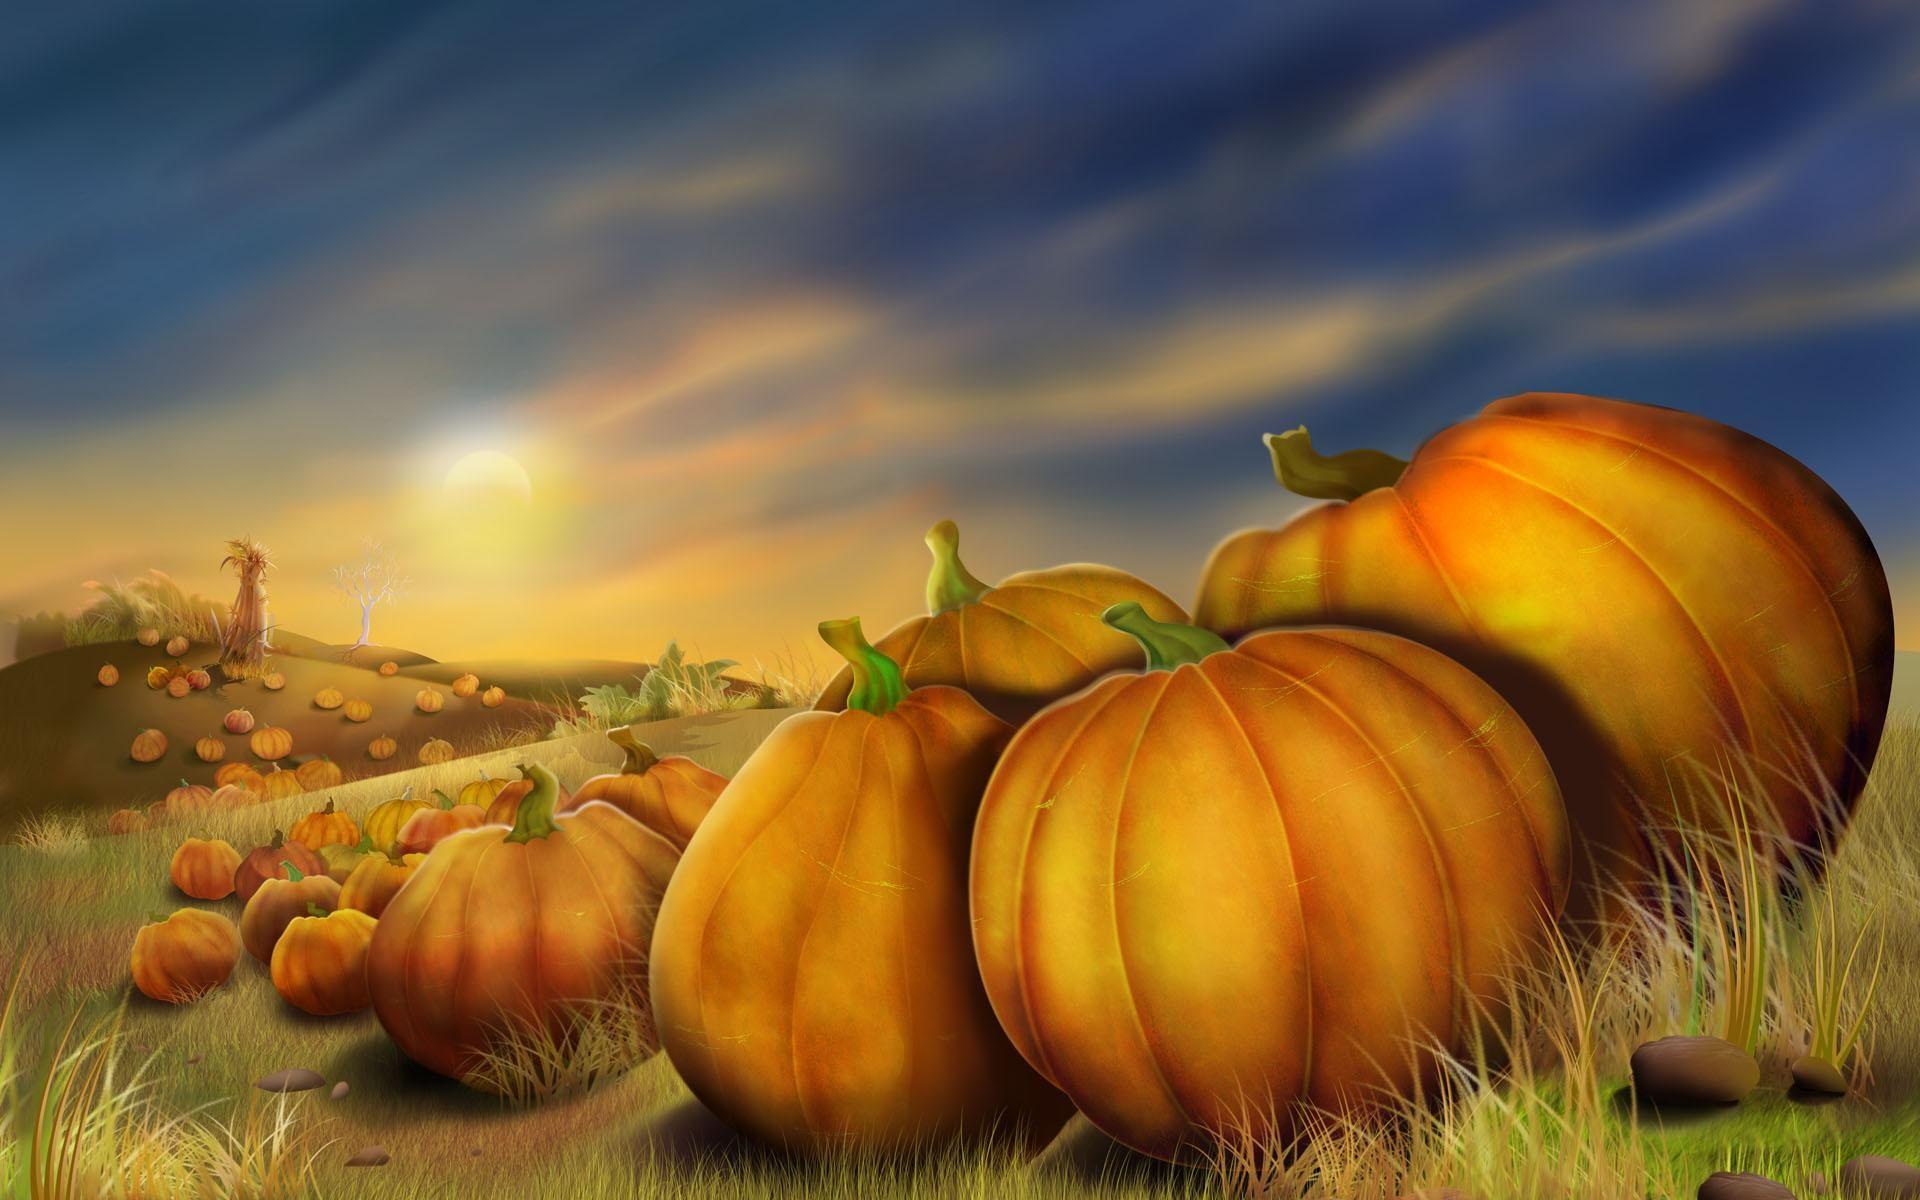 Thanksgiving Pumpkins Thanksgiving background